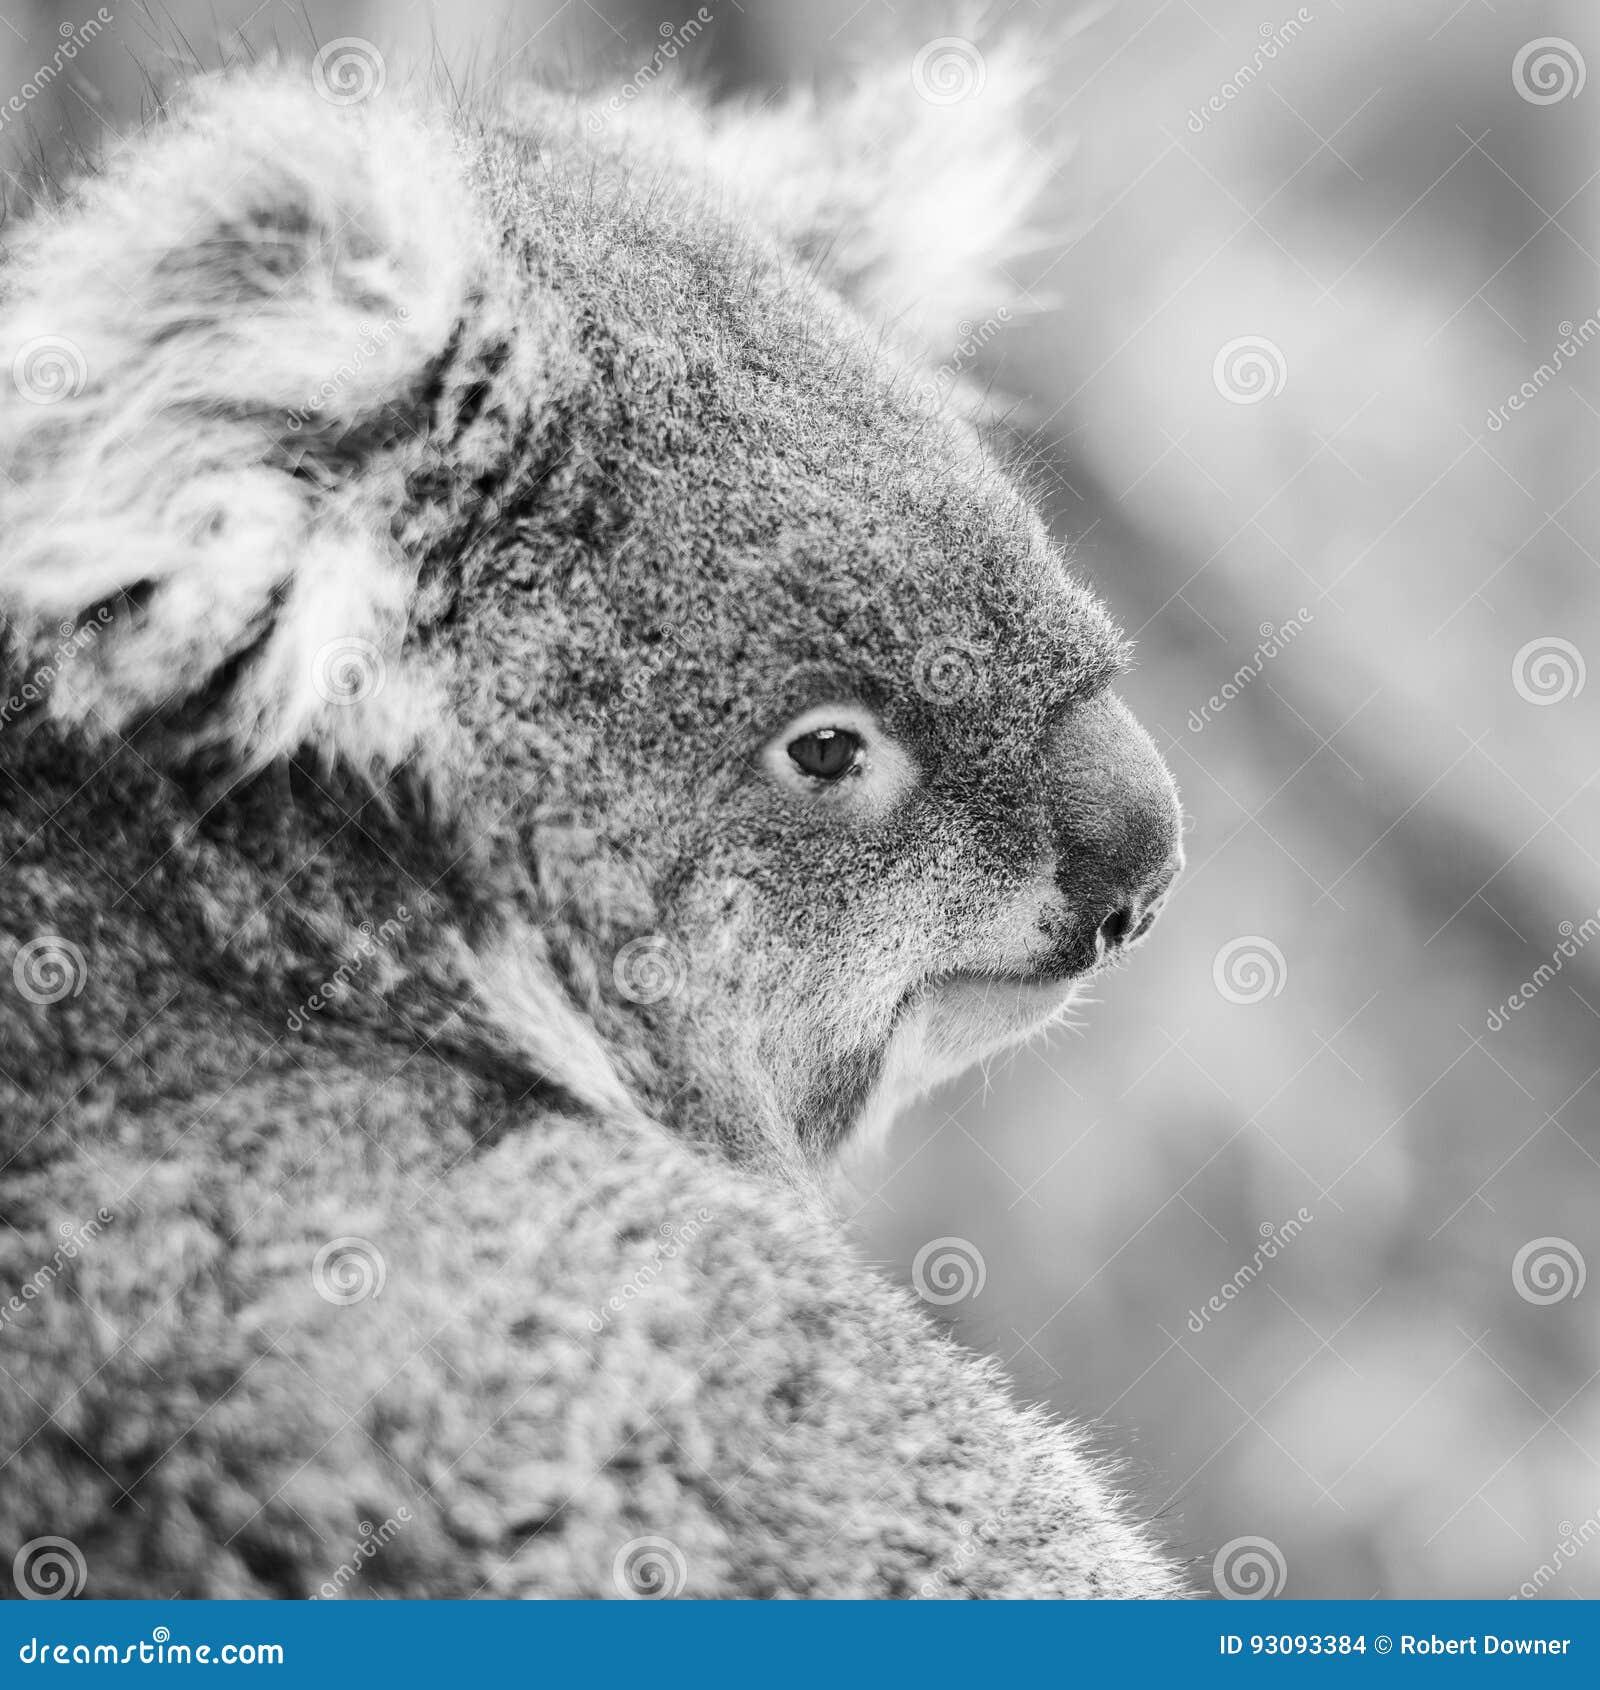 Australian koala outdoors in a eucalyptus tree black and white